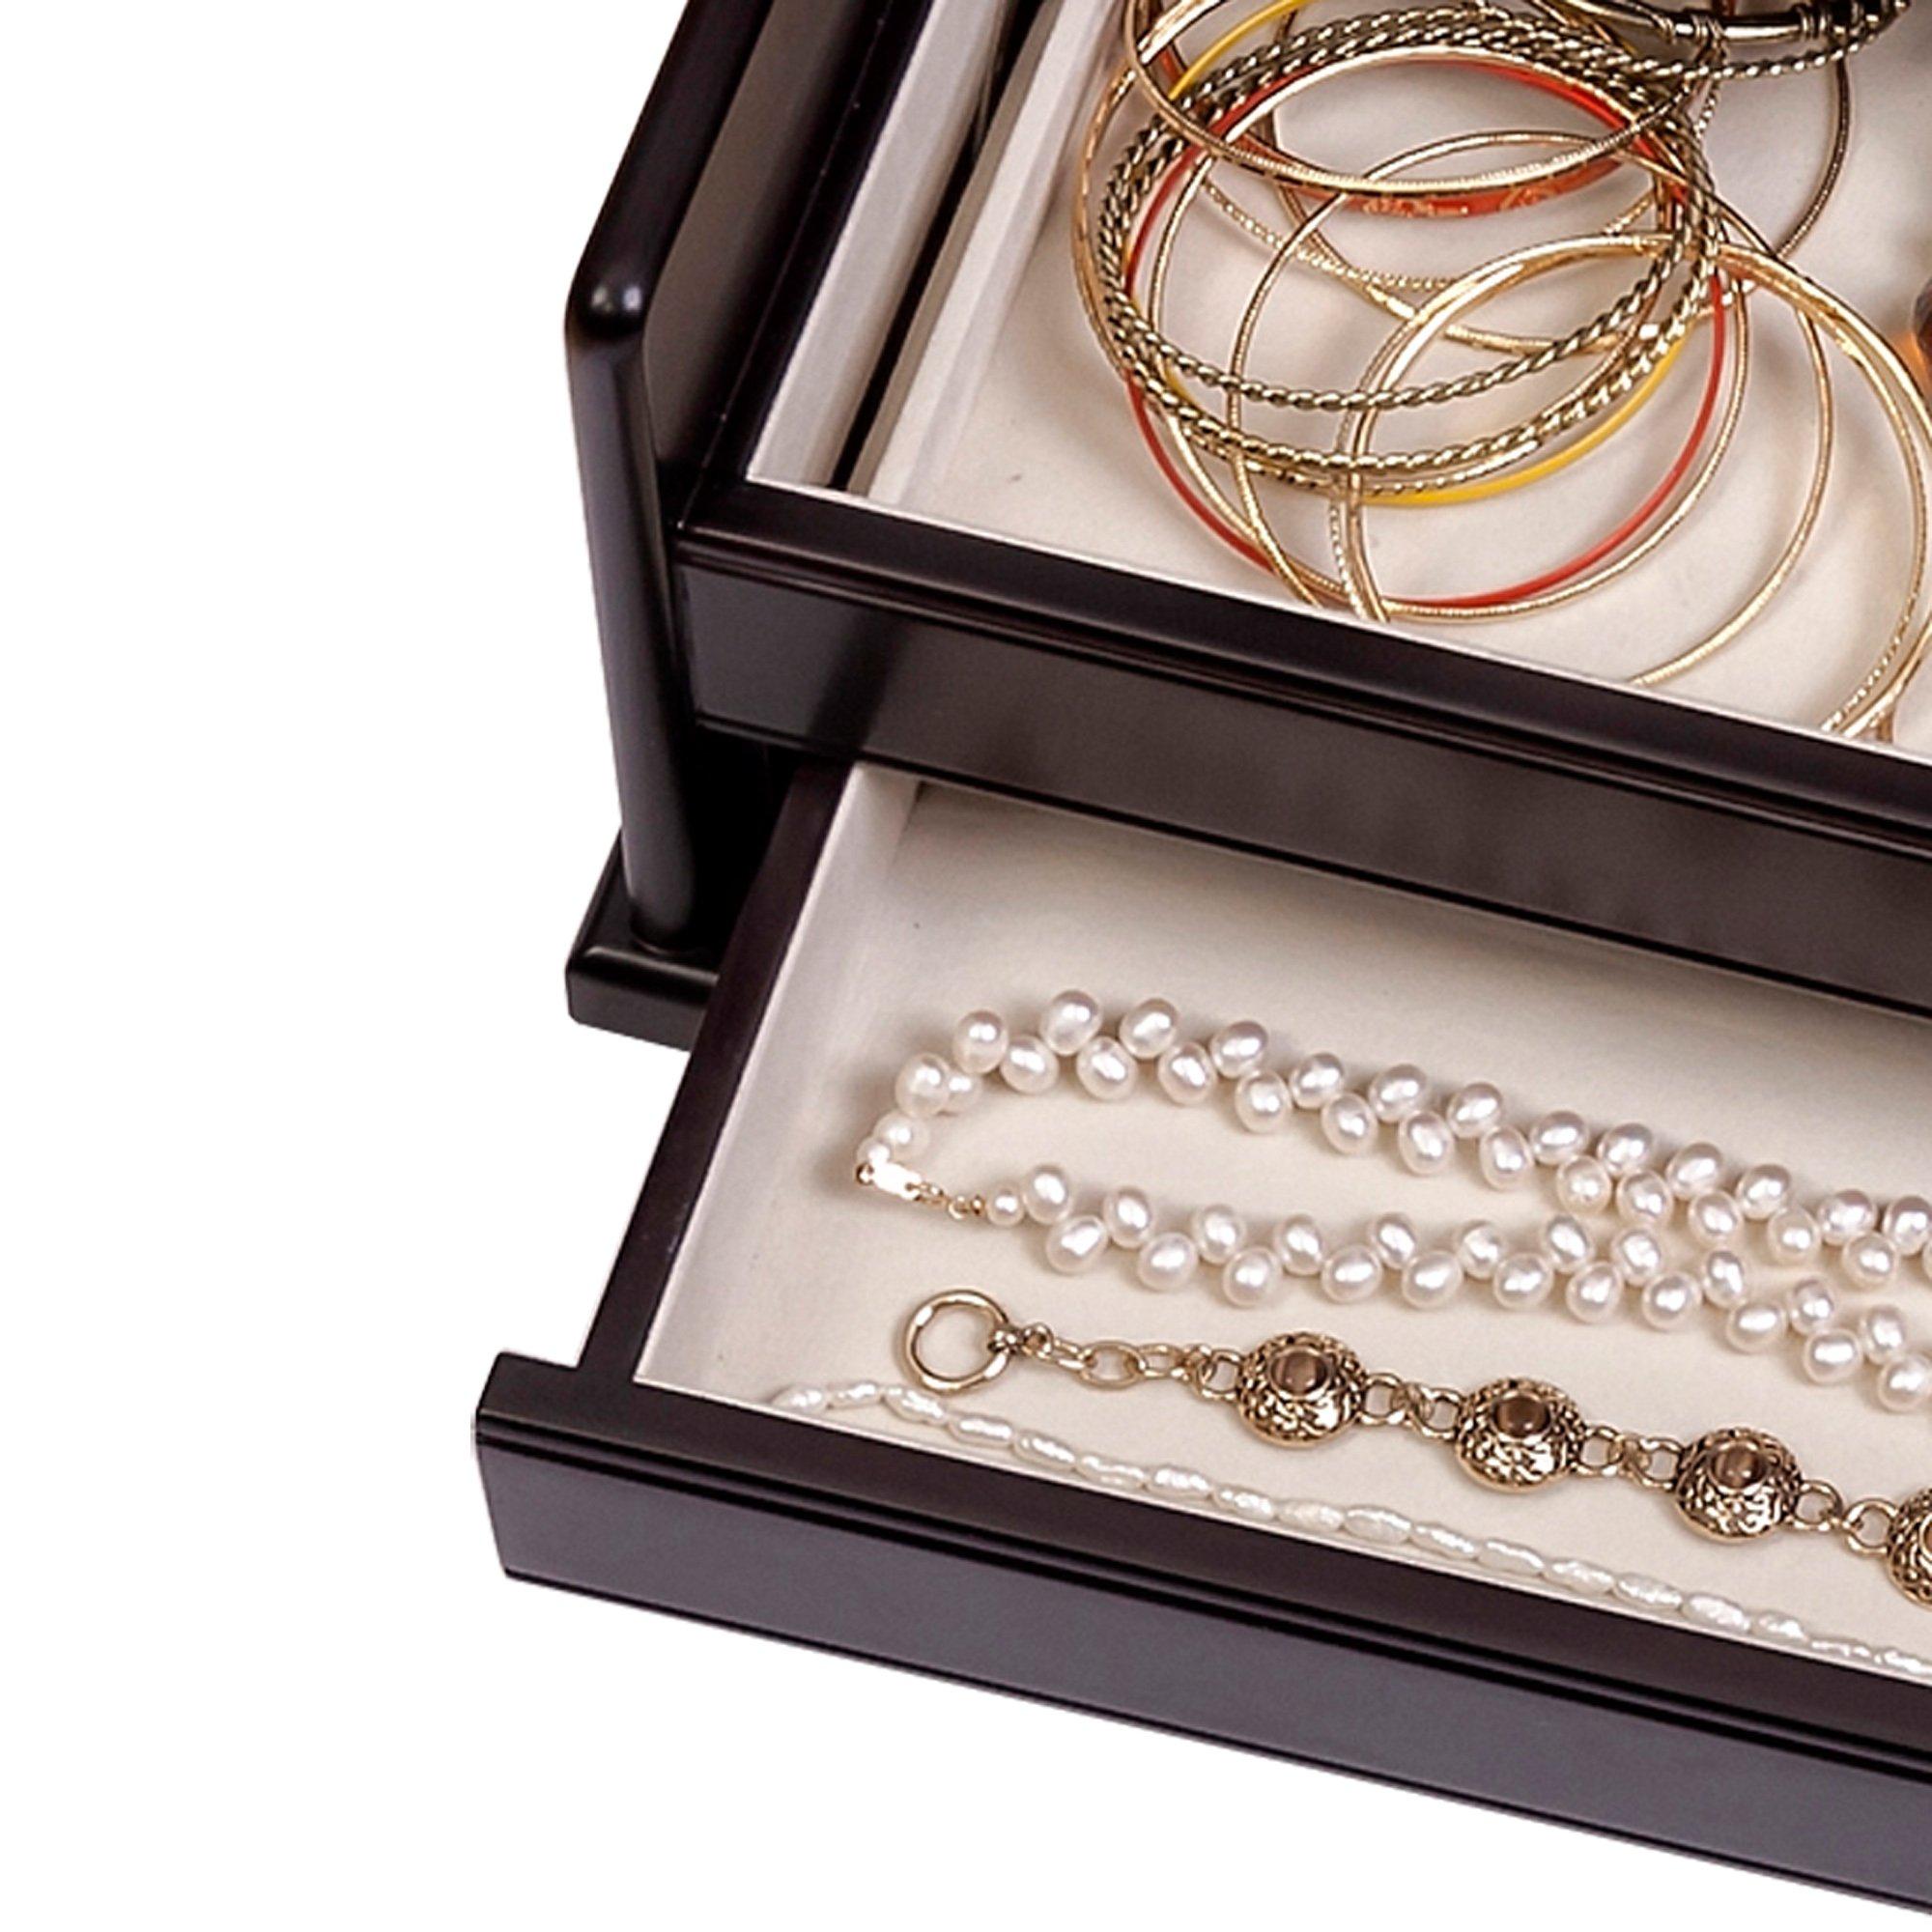 Mele & Co. Juliette Wooden Jewelry Box (Java Finish) by Mele & Co. (Image #5)